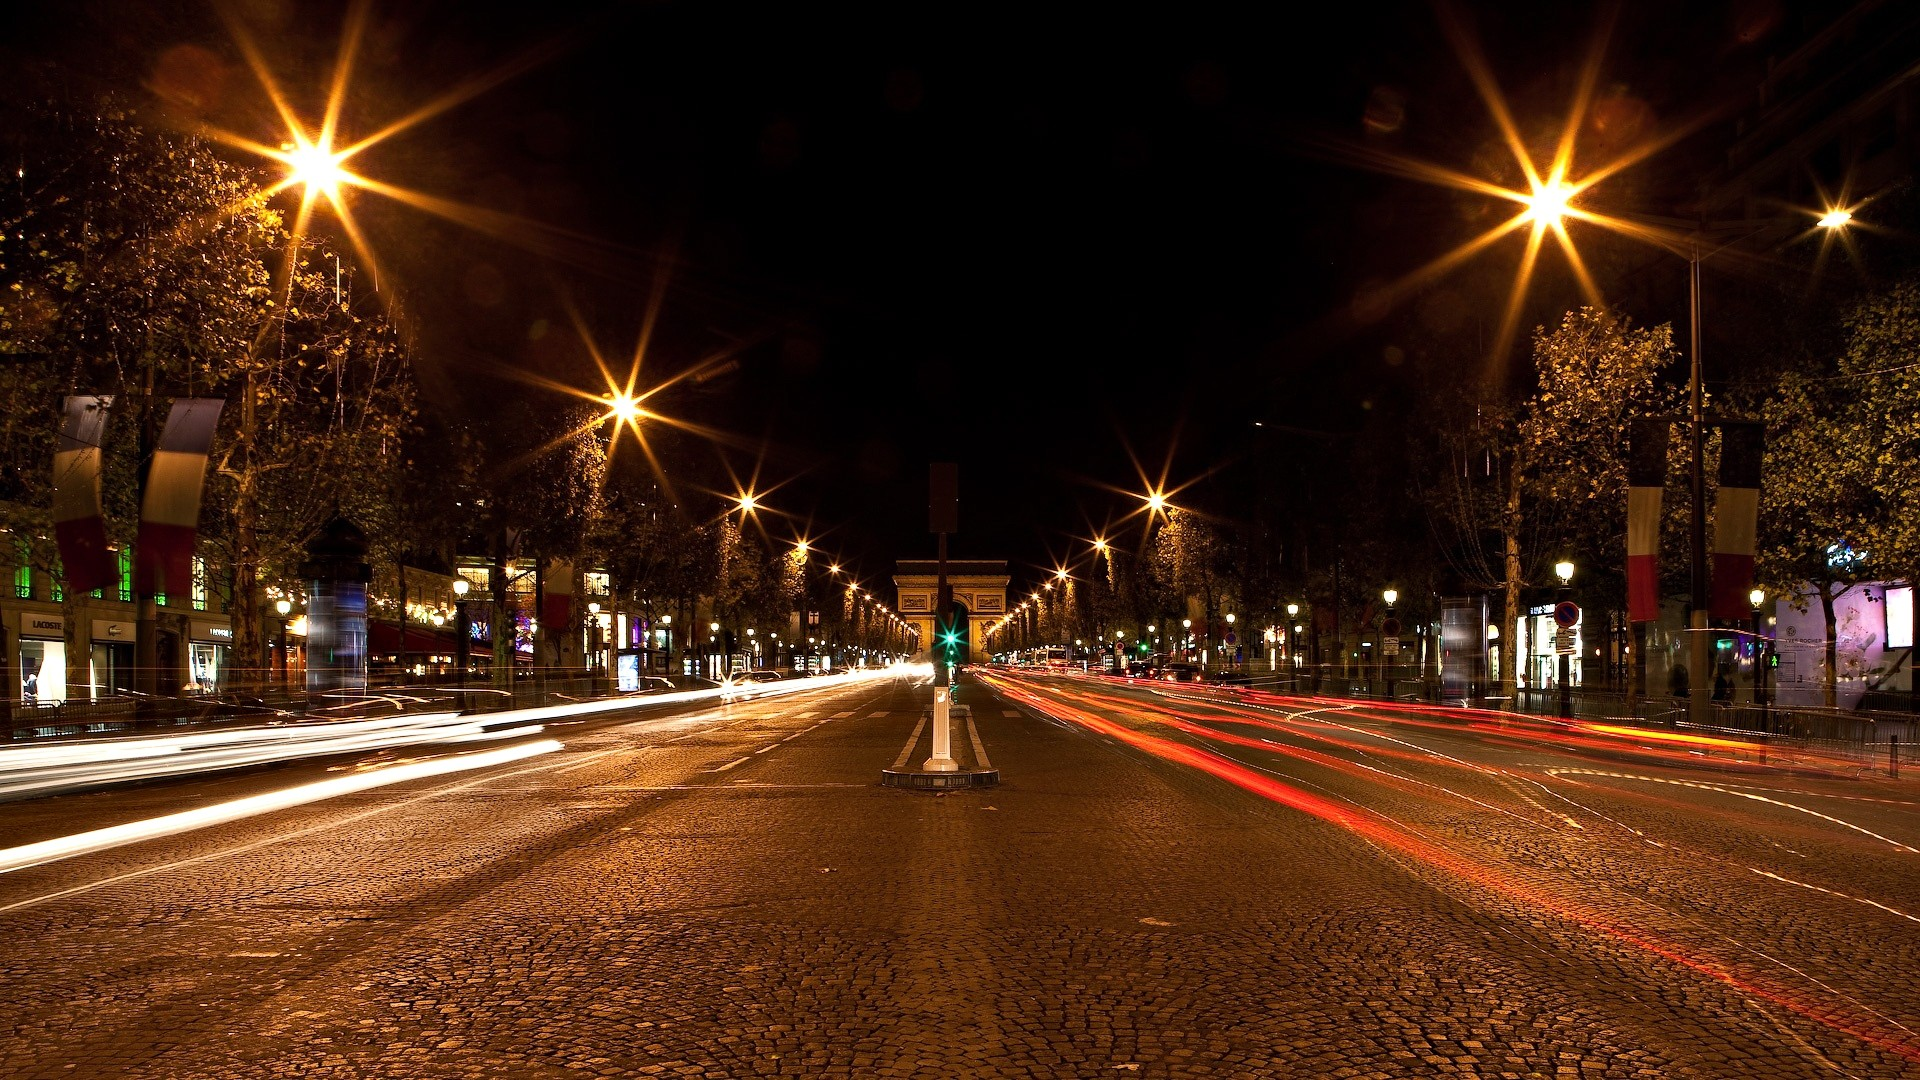 City Street Lights Day